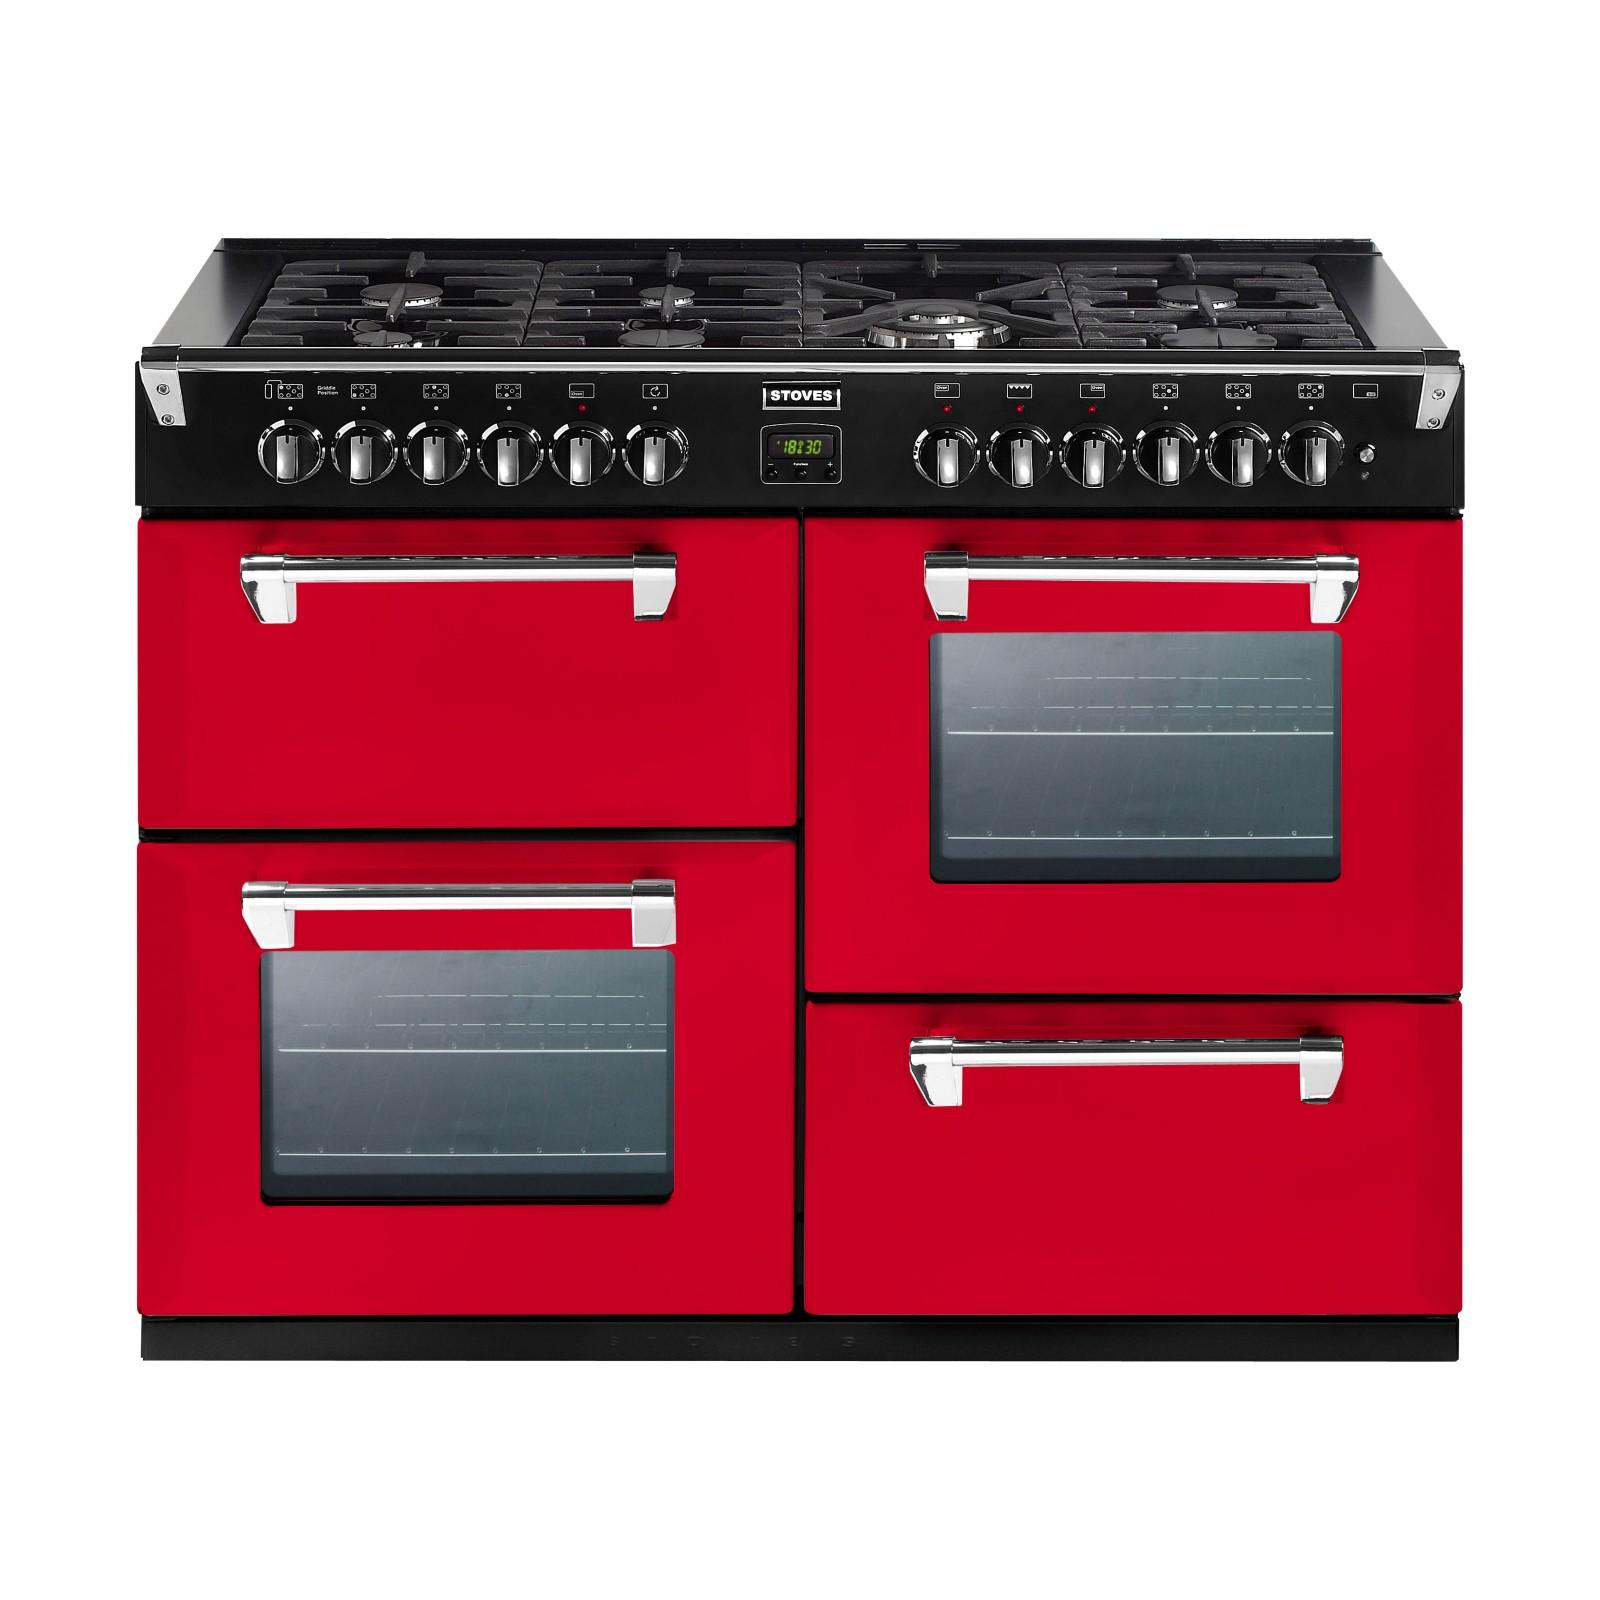 Stoves Richmond 1000DFT Freestanding Dual Fuel Range Cooker Hot Jalapeno